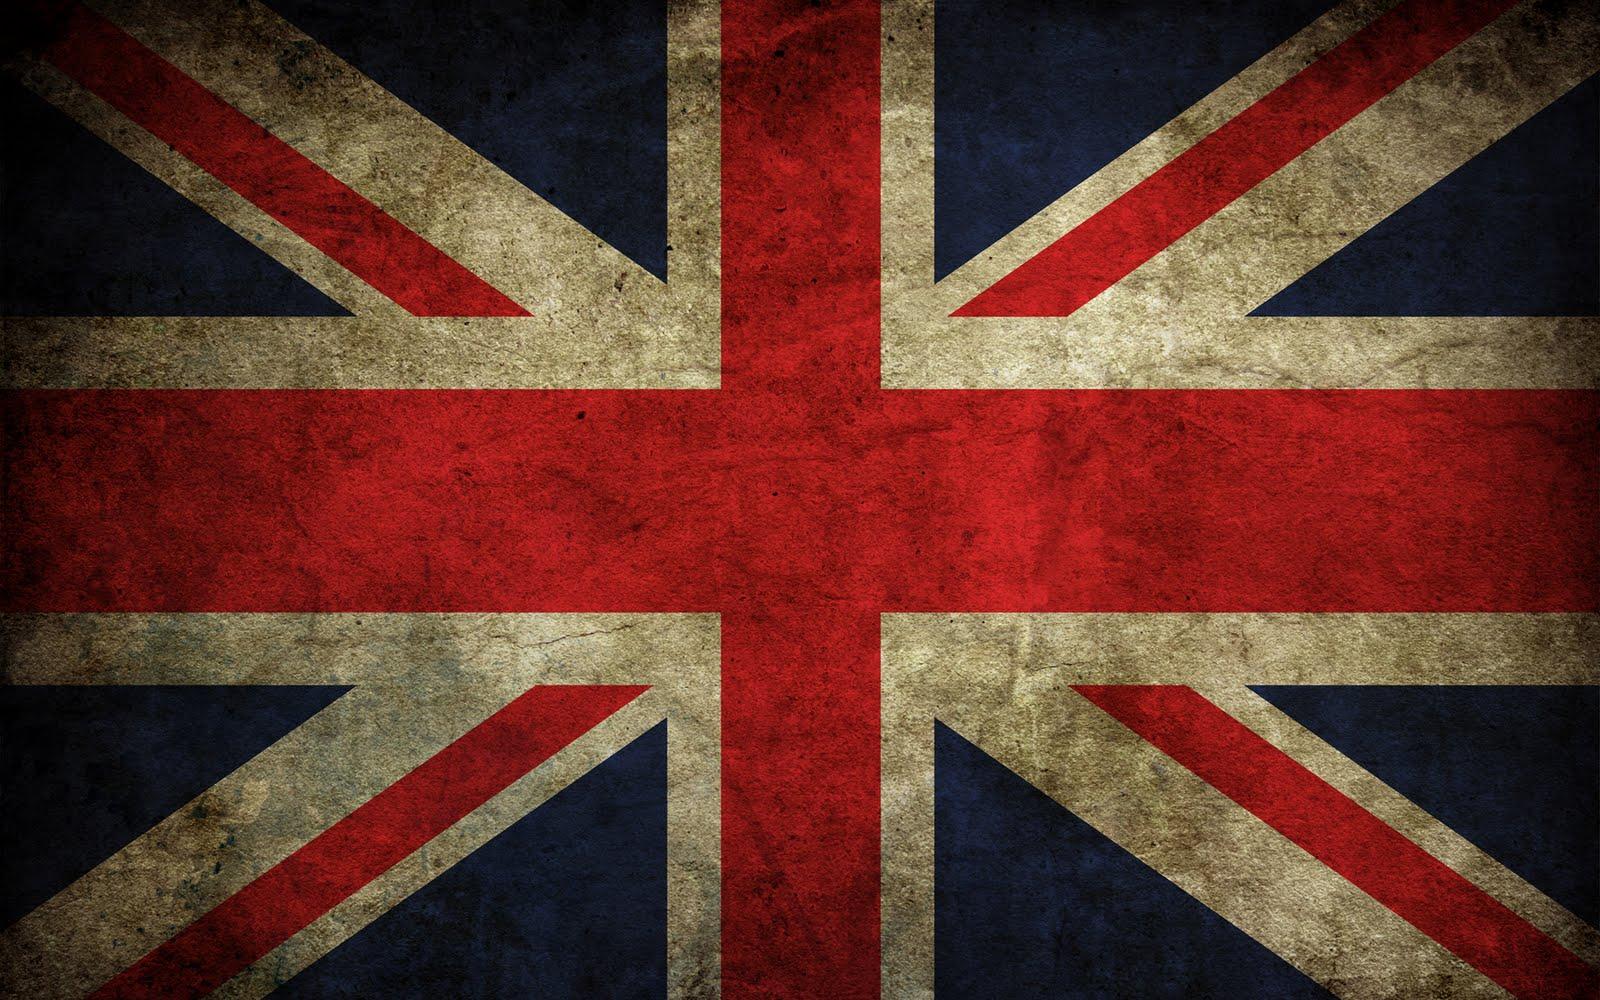 British بريطاني